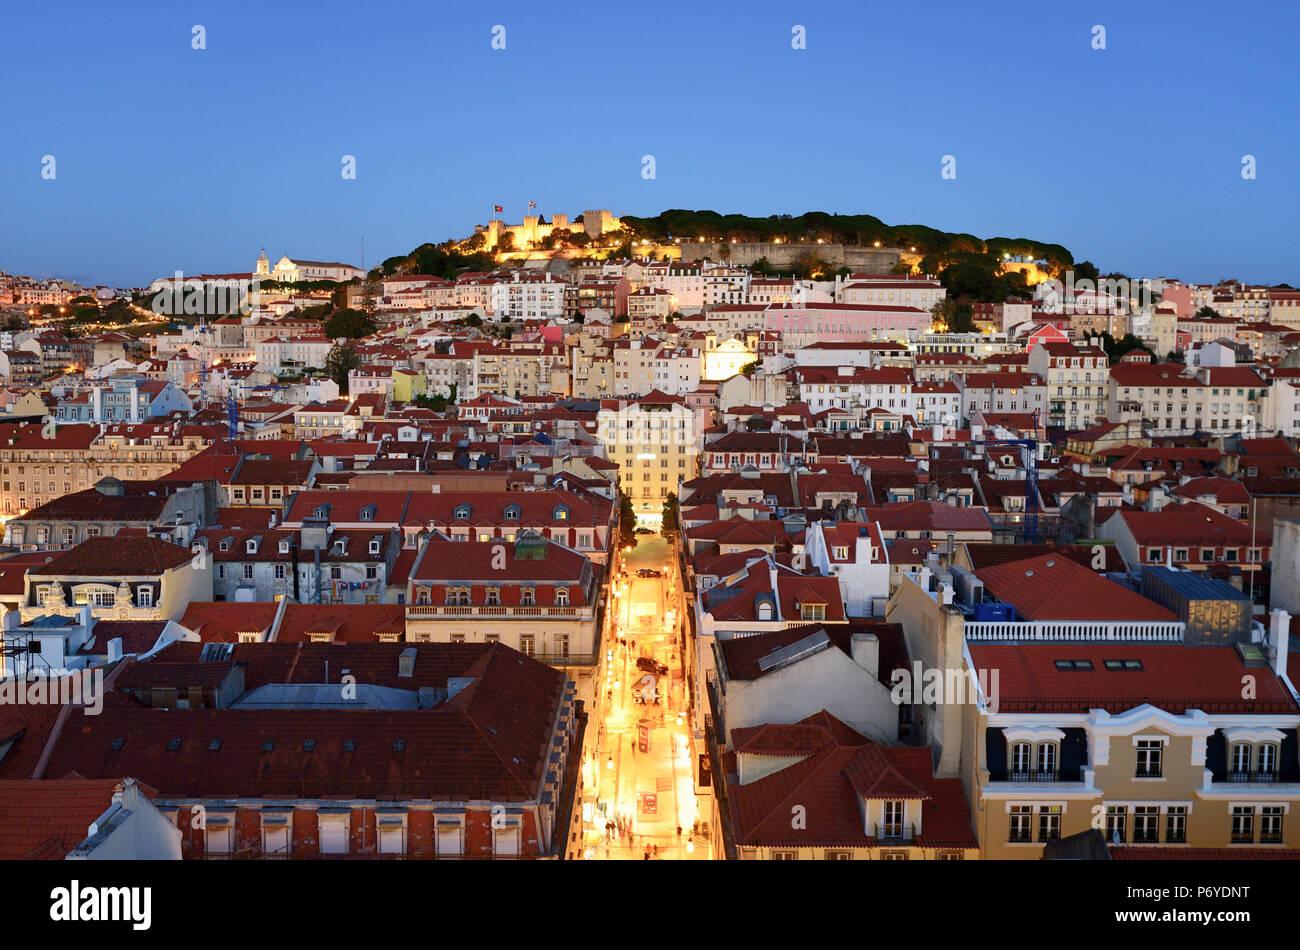 The historic centre (Baixa) and Sao Jorge castle at twilight. Lisbon, Portugal Stock Photo